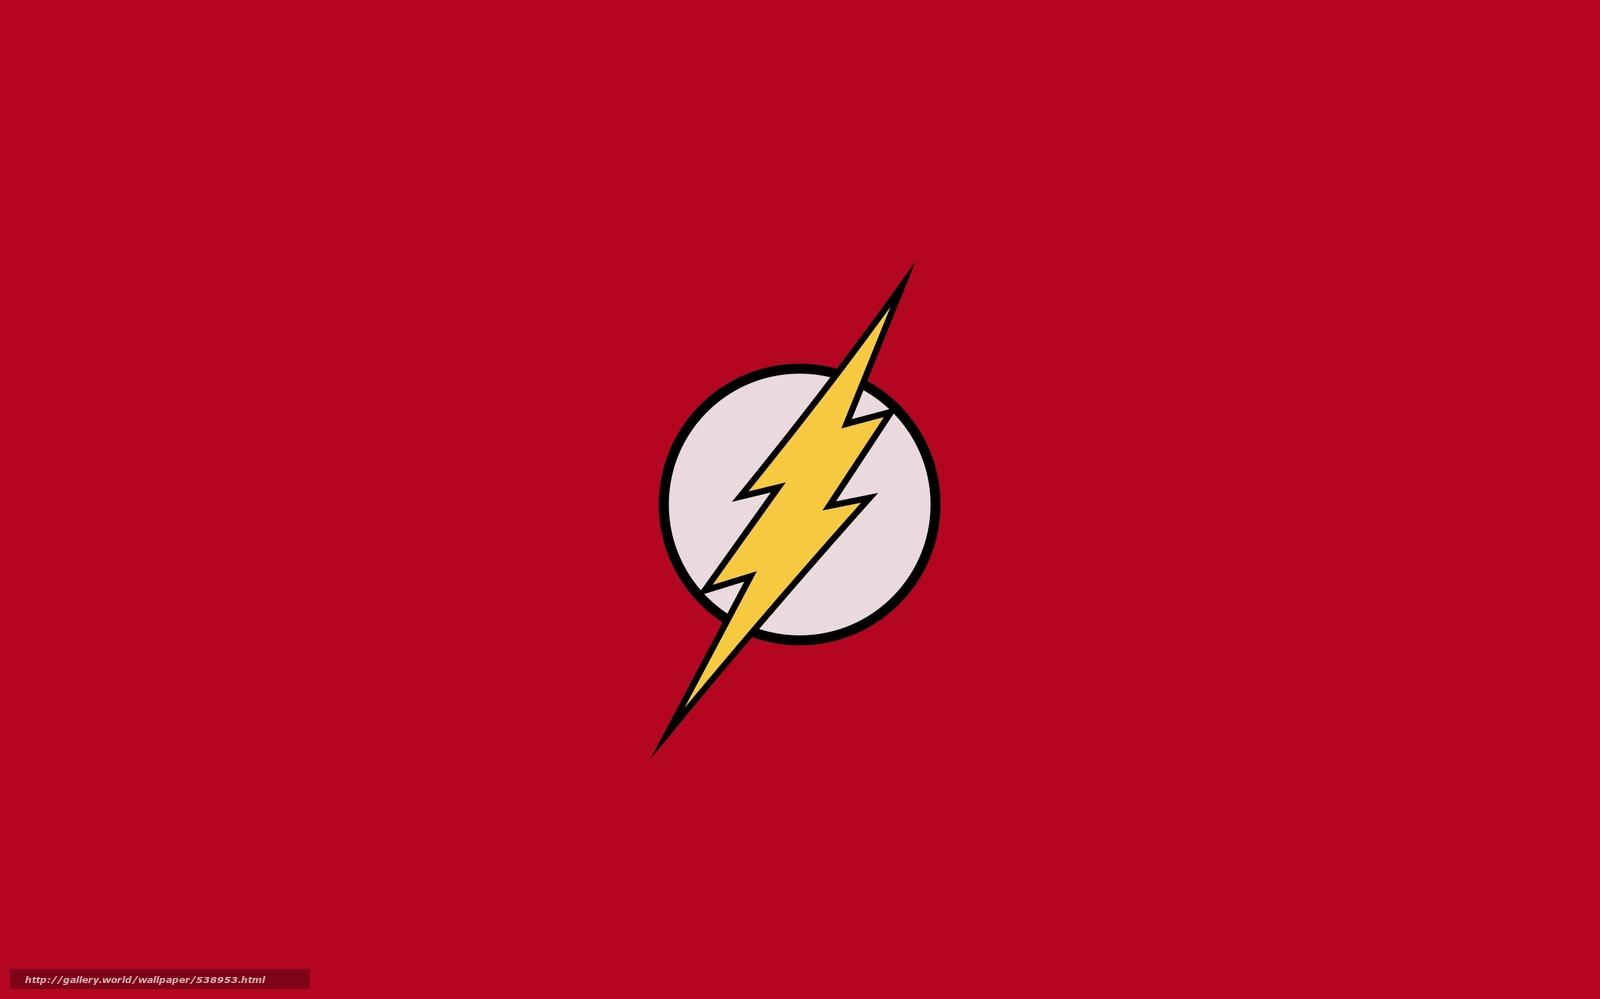 the minimalist hero cool flash 538953 1600x999